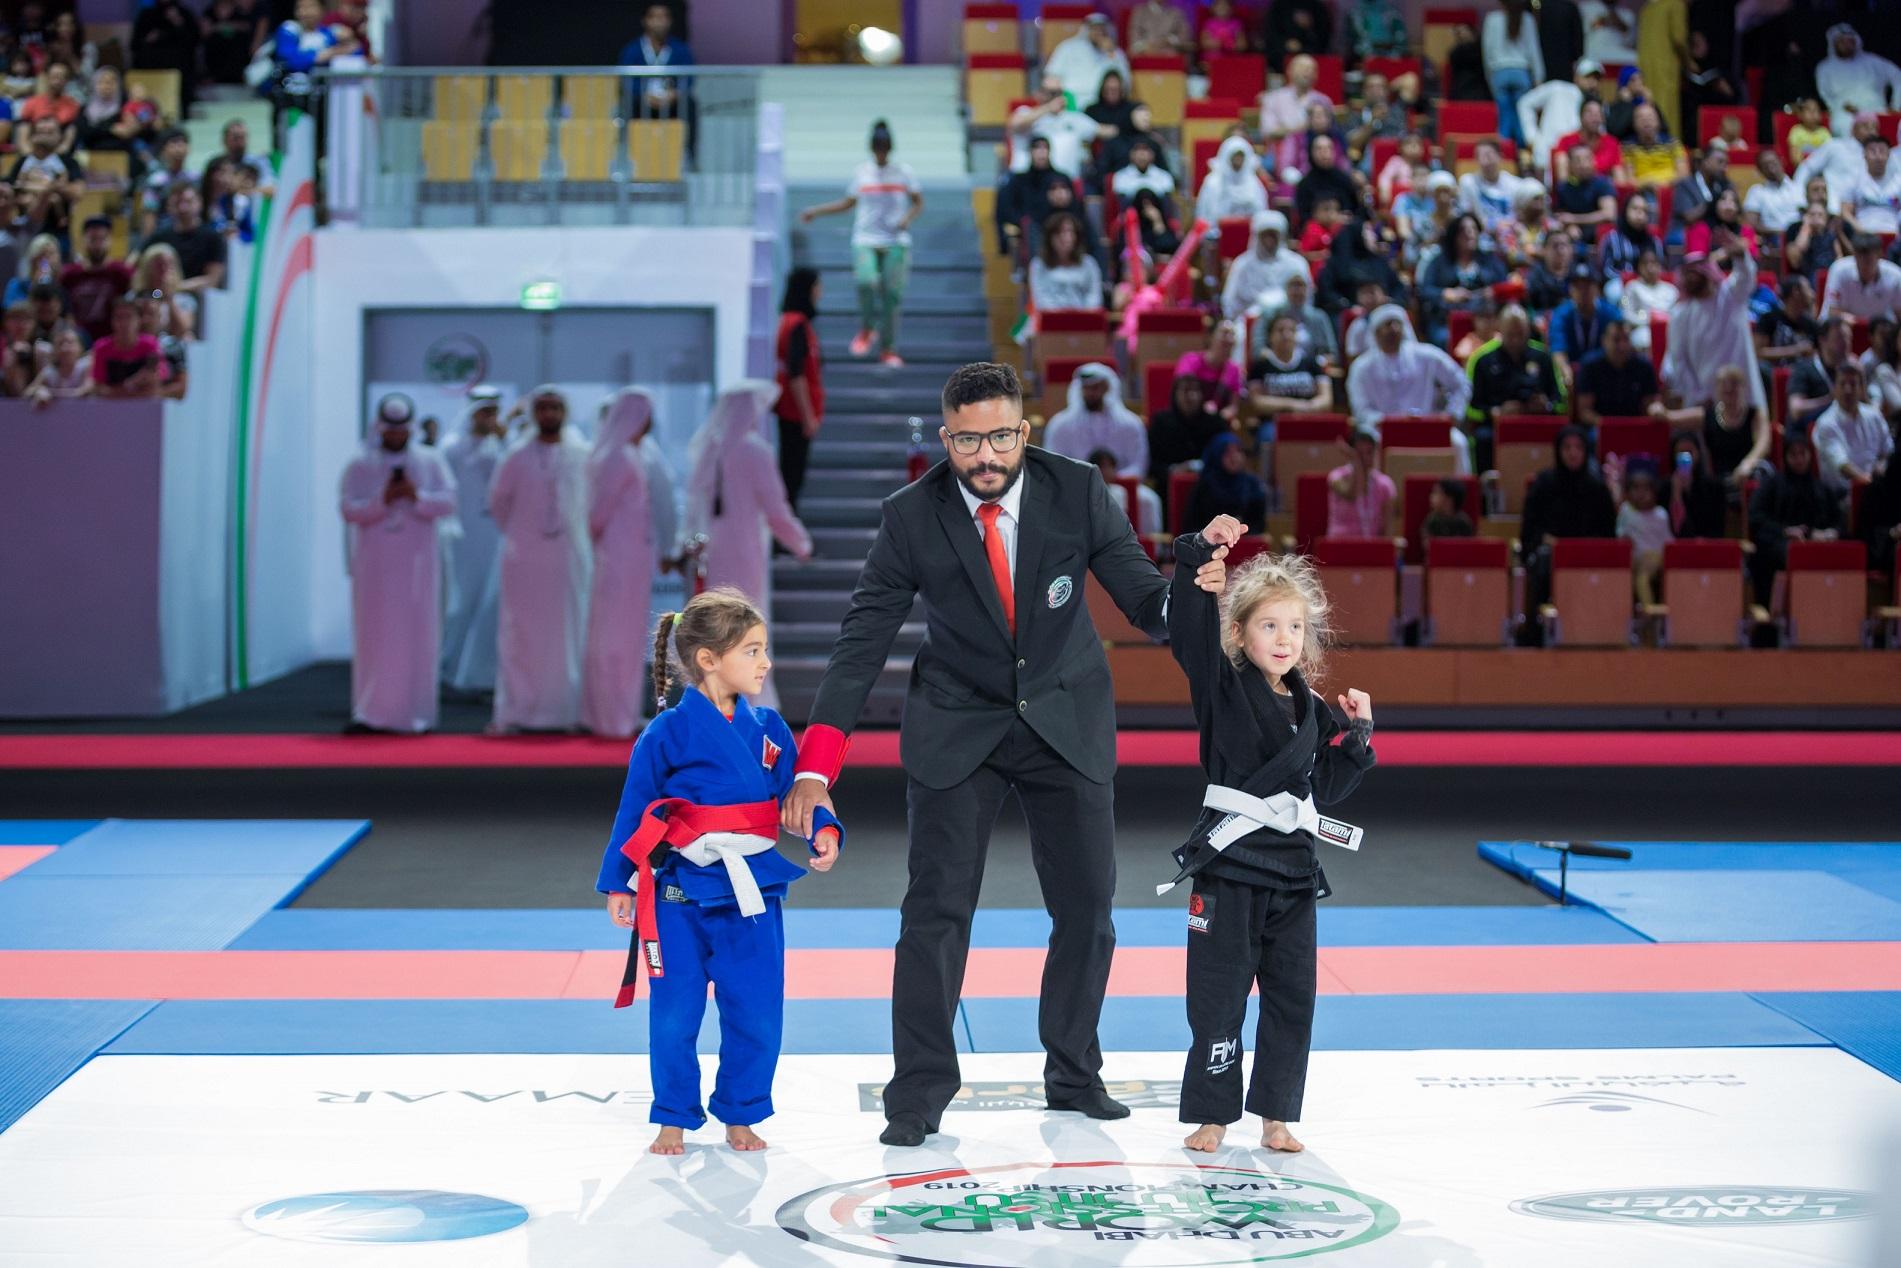 abu dhabi world professional jiu-jitsu championship shows jiu-jitsu is a sport for all 3.jpg